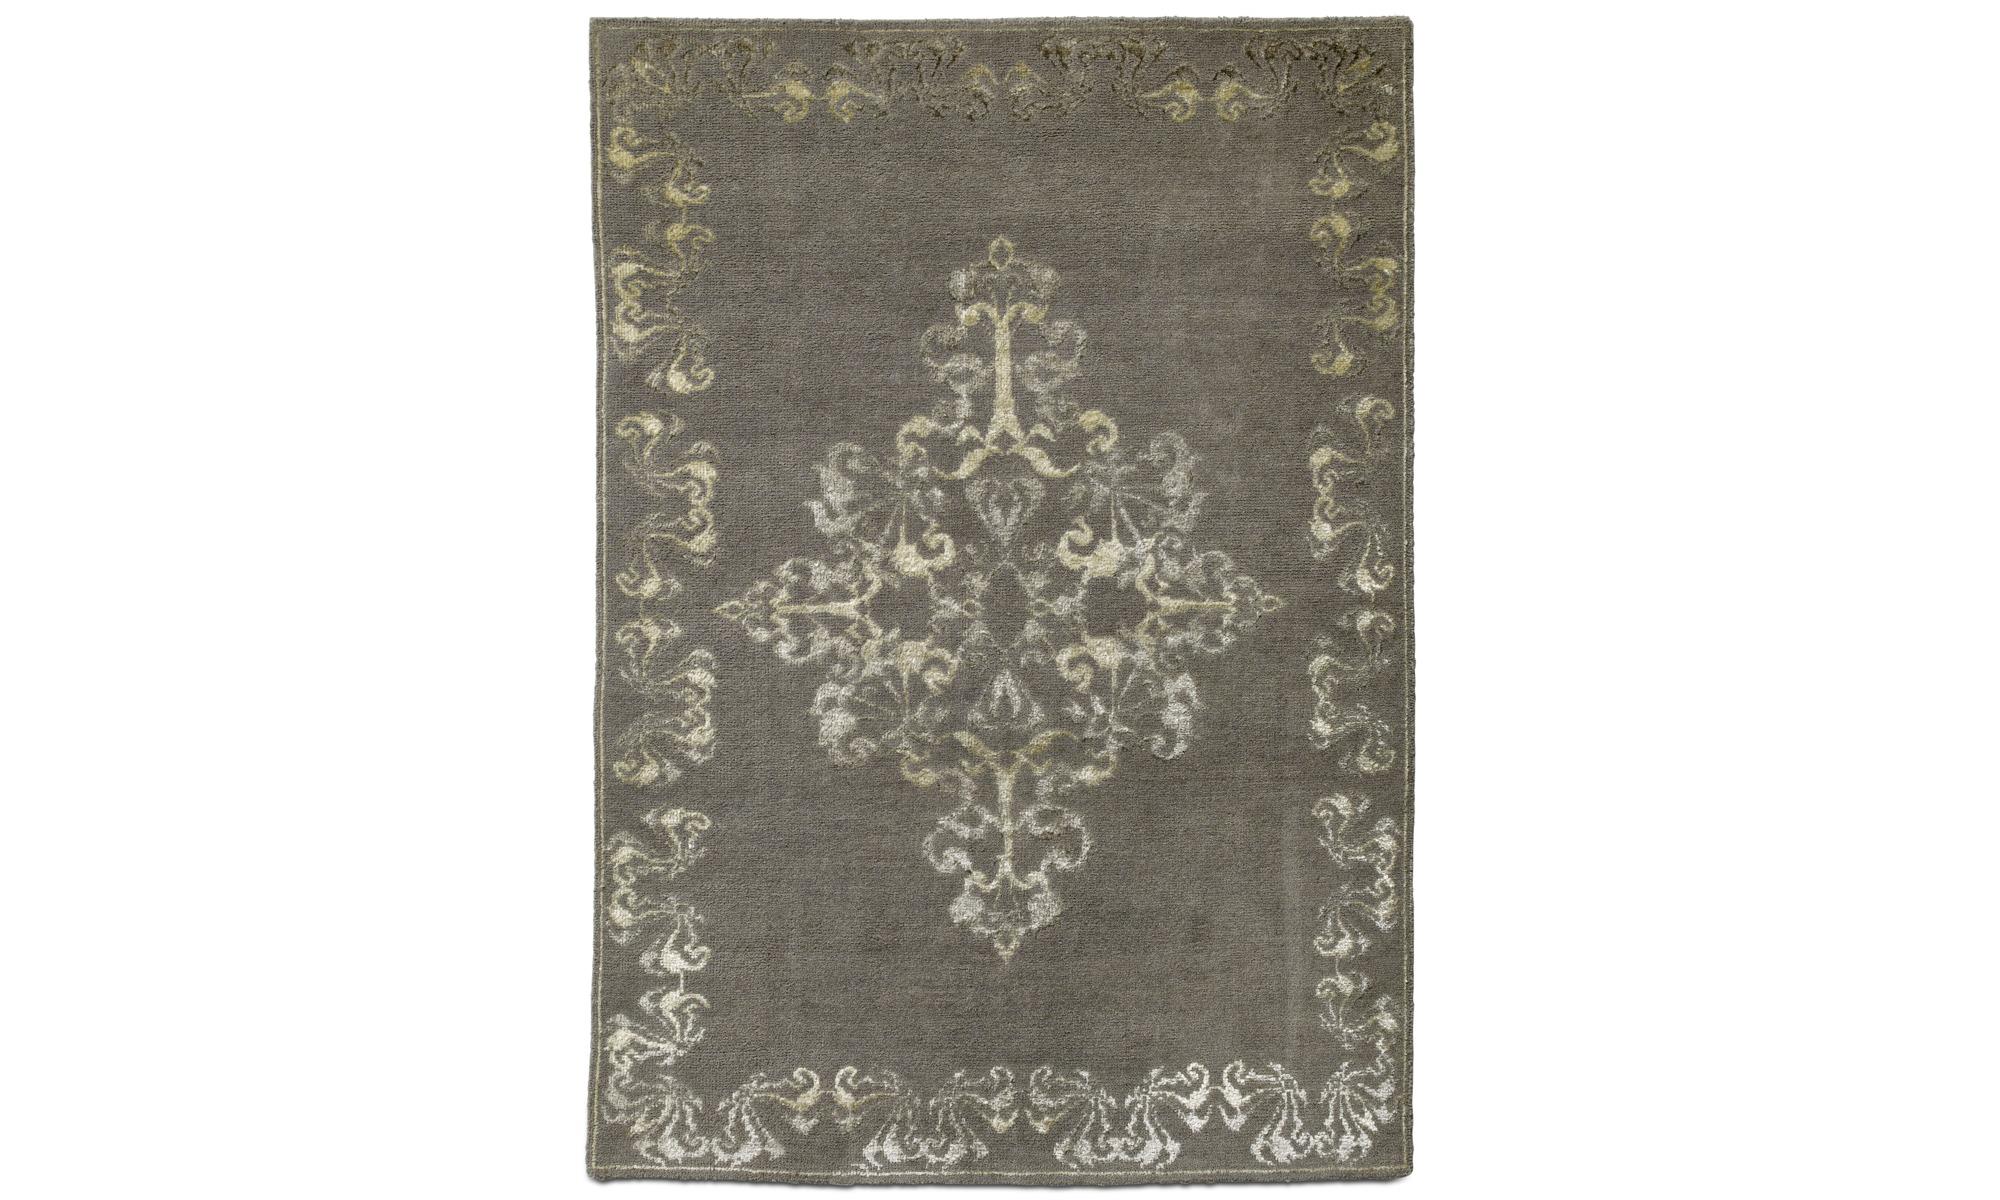 Dywany - Dywan Niska - prostokątny - Szary - Tkanina